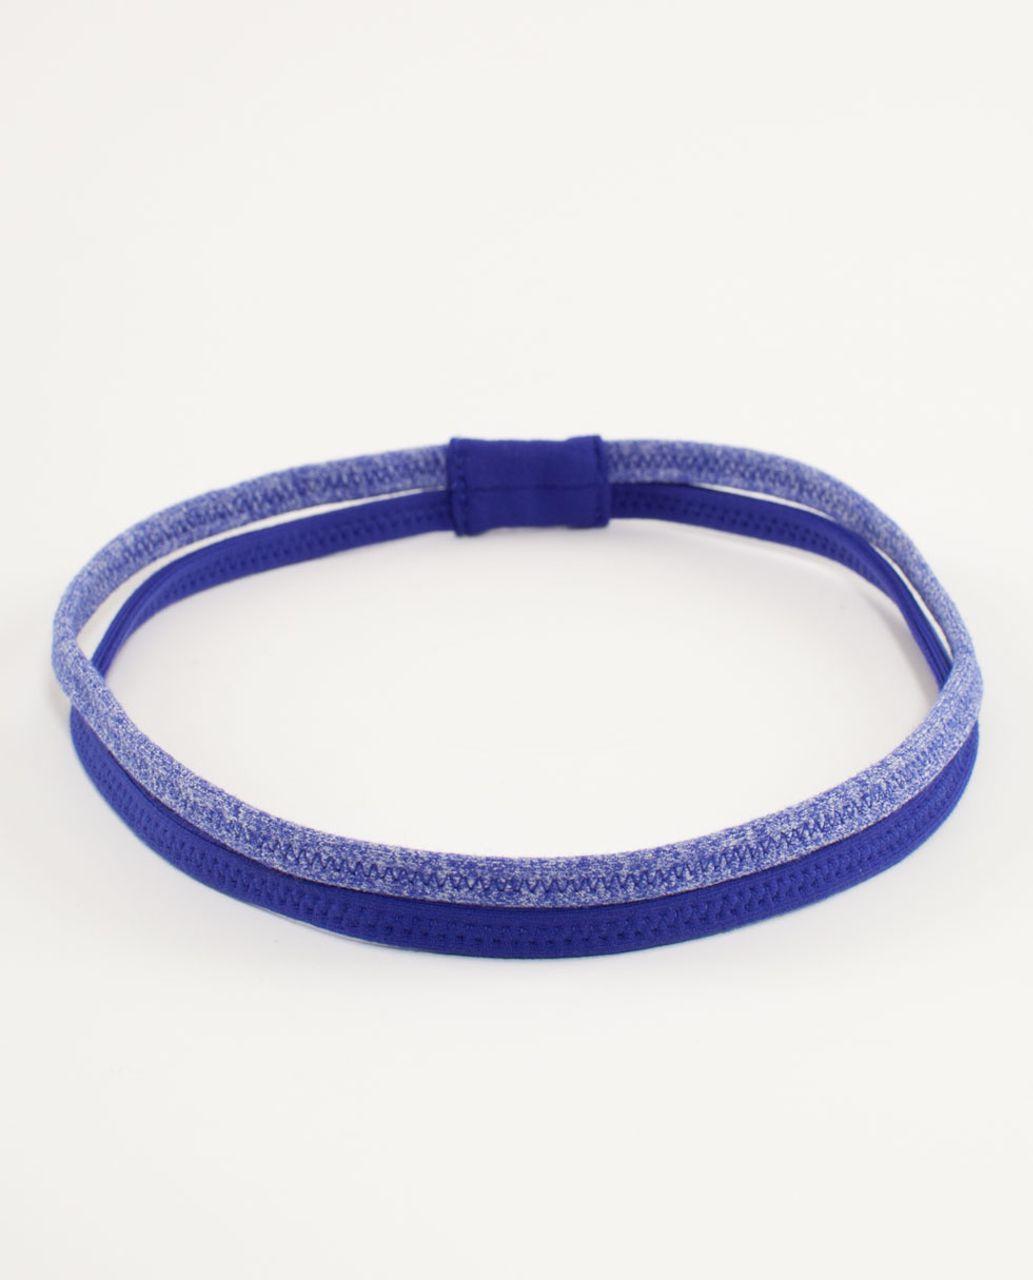 Lululemon DANCE! Headband - Pigment Blue /  Heathered Pigment Blue